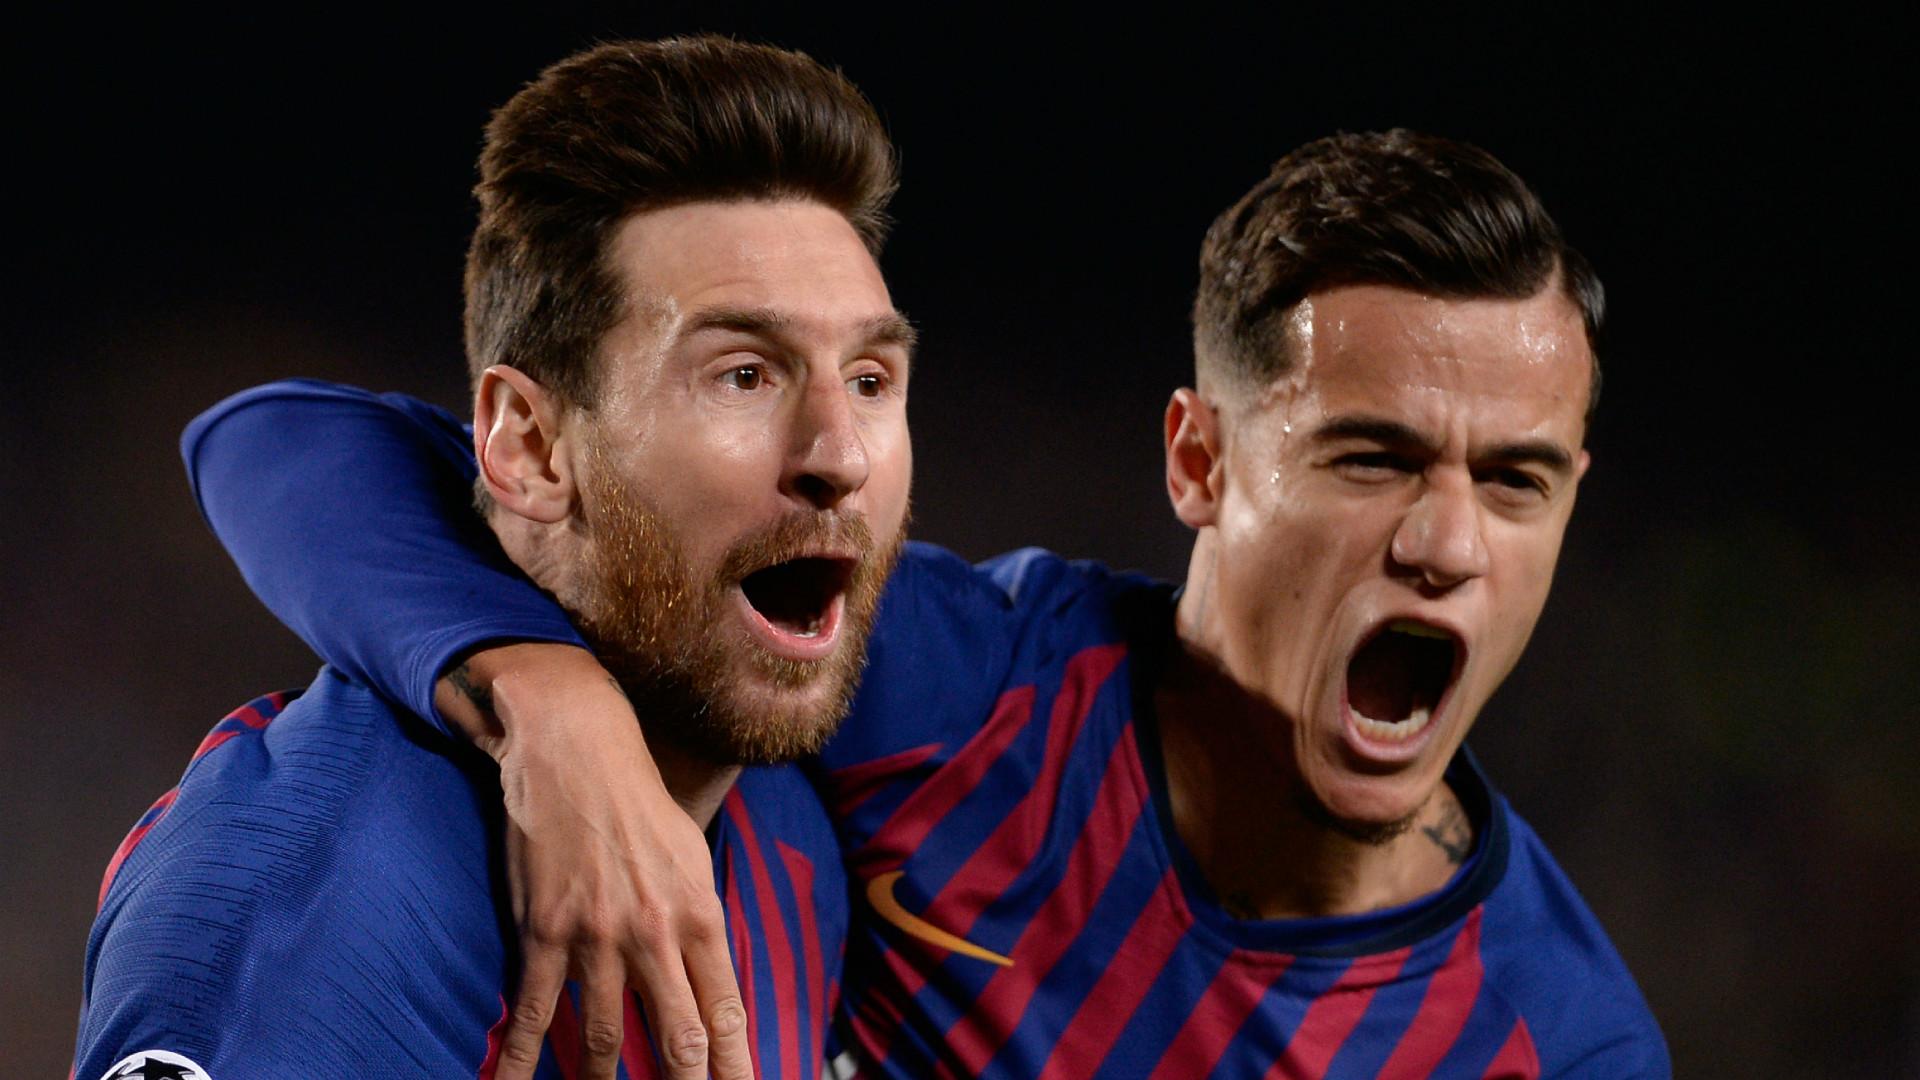 Messi wants the crown: Europe's top scorer firing Barcelona to glory